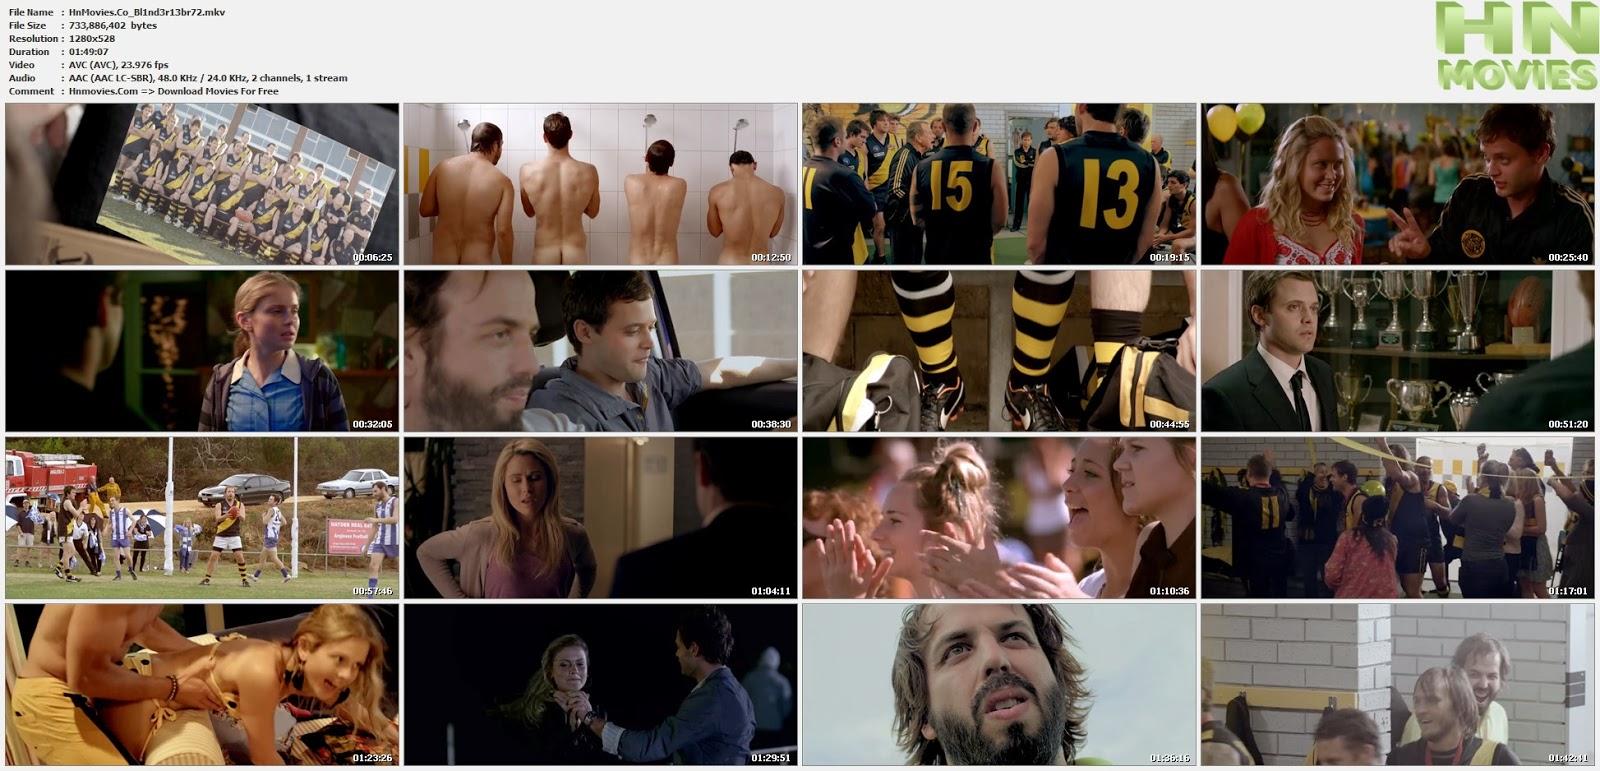 movie screenshot of Blinder fdmovie.com